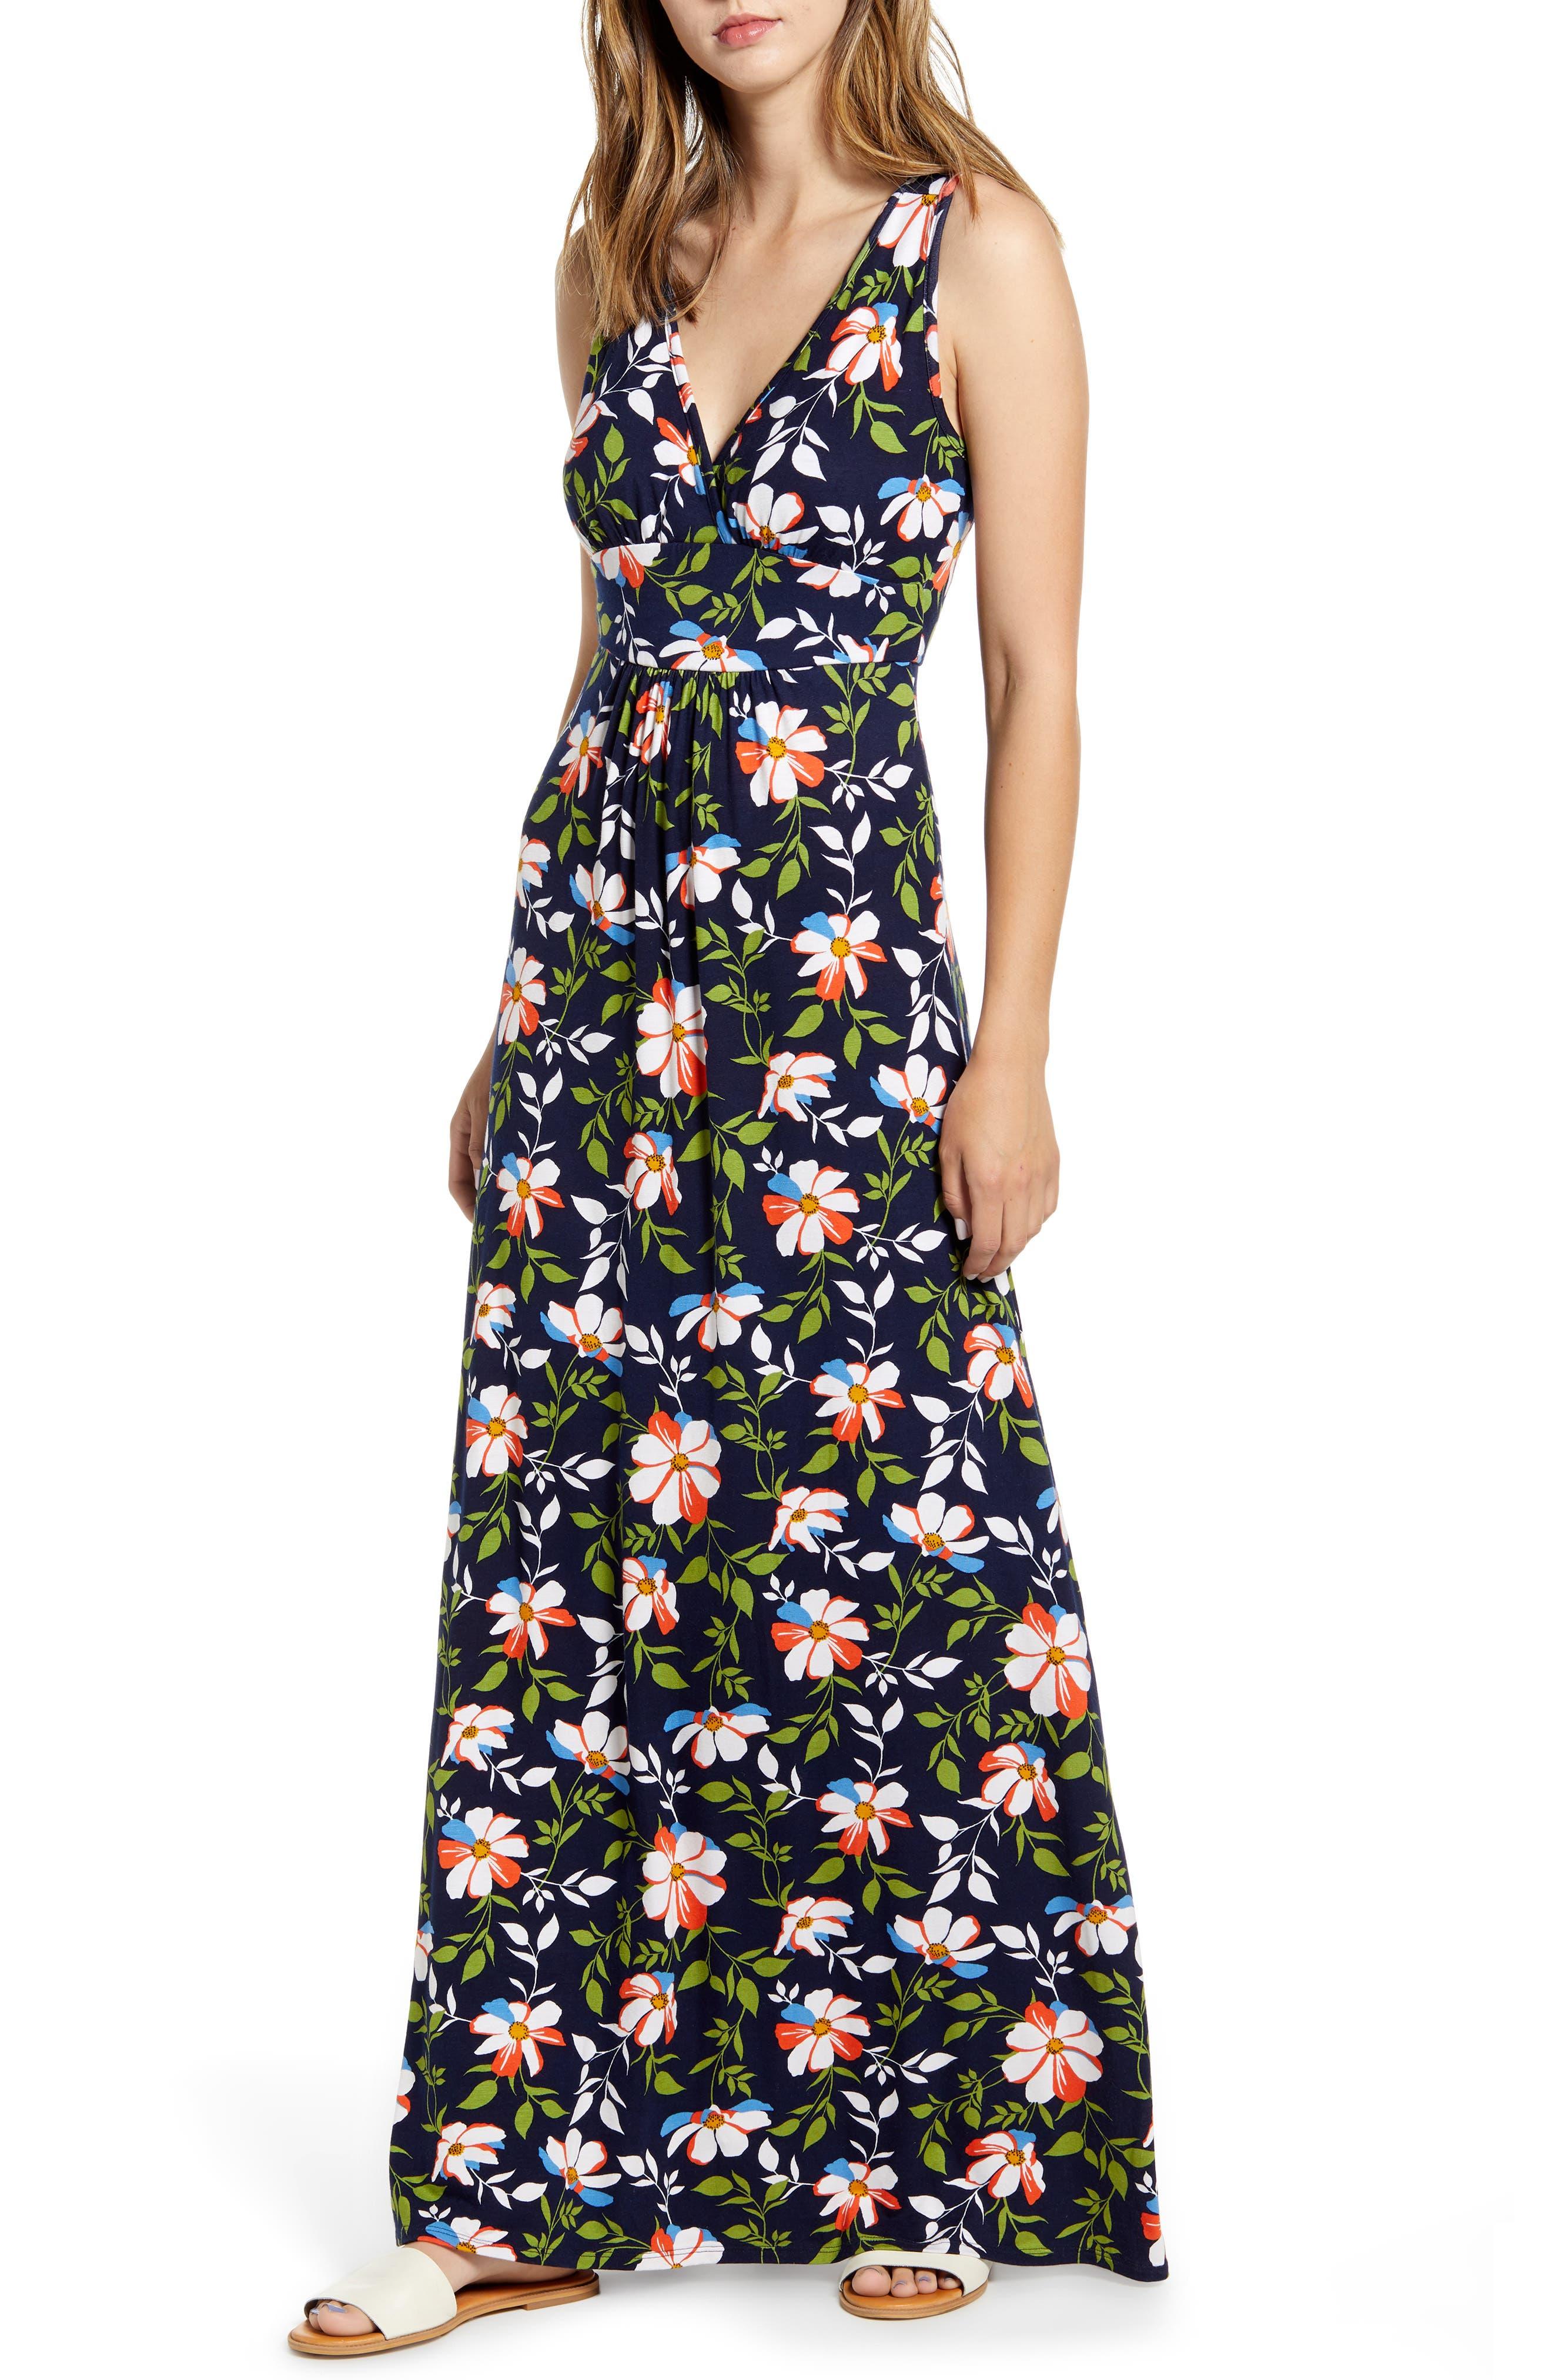 Loveappella Surplice Floral Jersey Maxi Dress, Blue